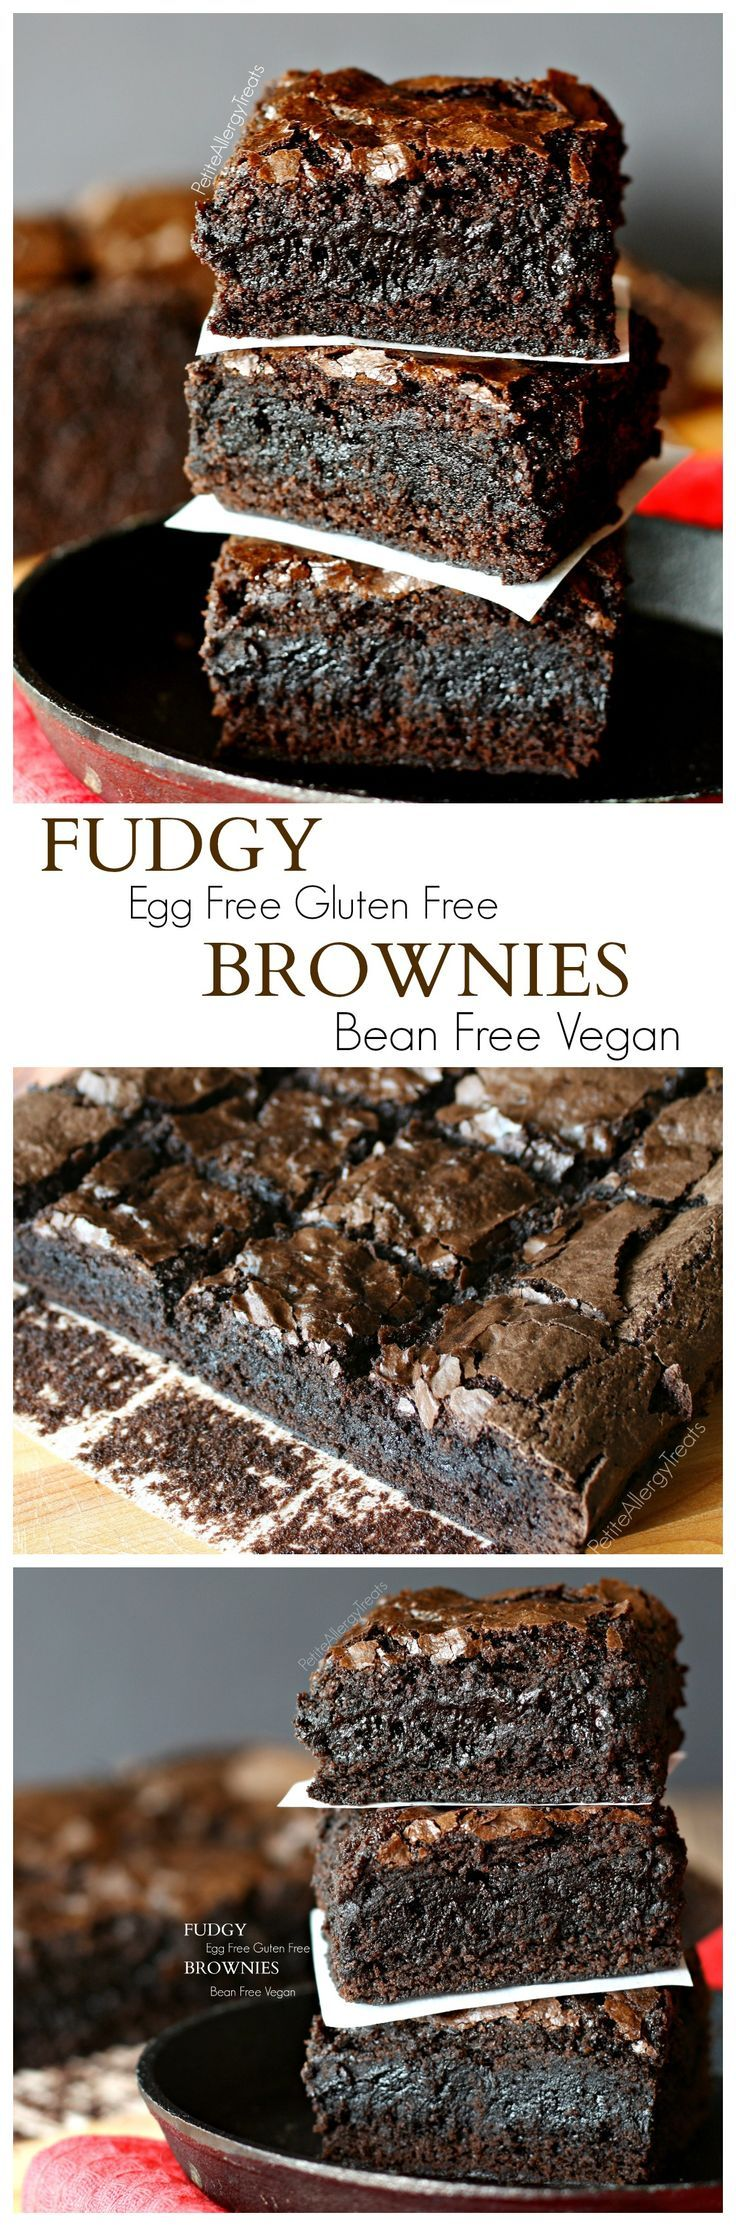 Fudgy Brownies (Gluten free Egg Free No Bean Vegan)- Sub flour and milk for paleo